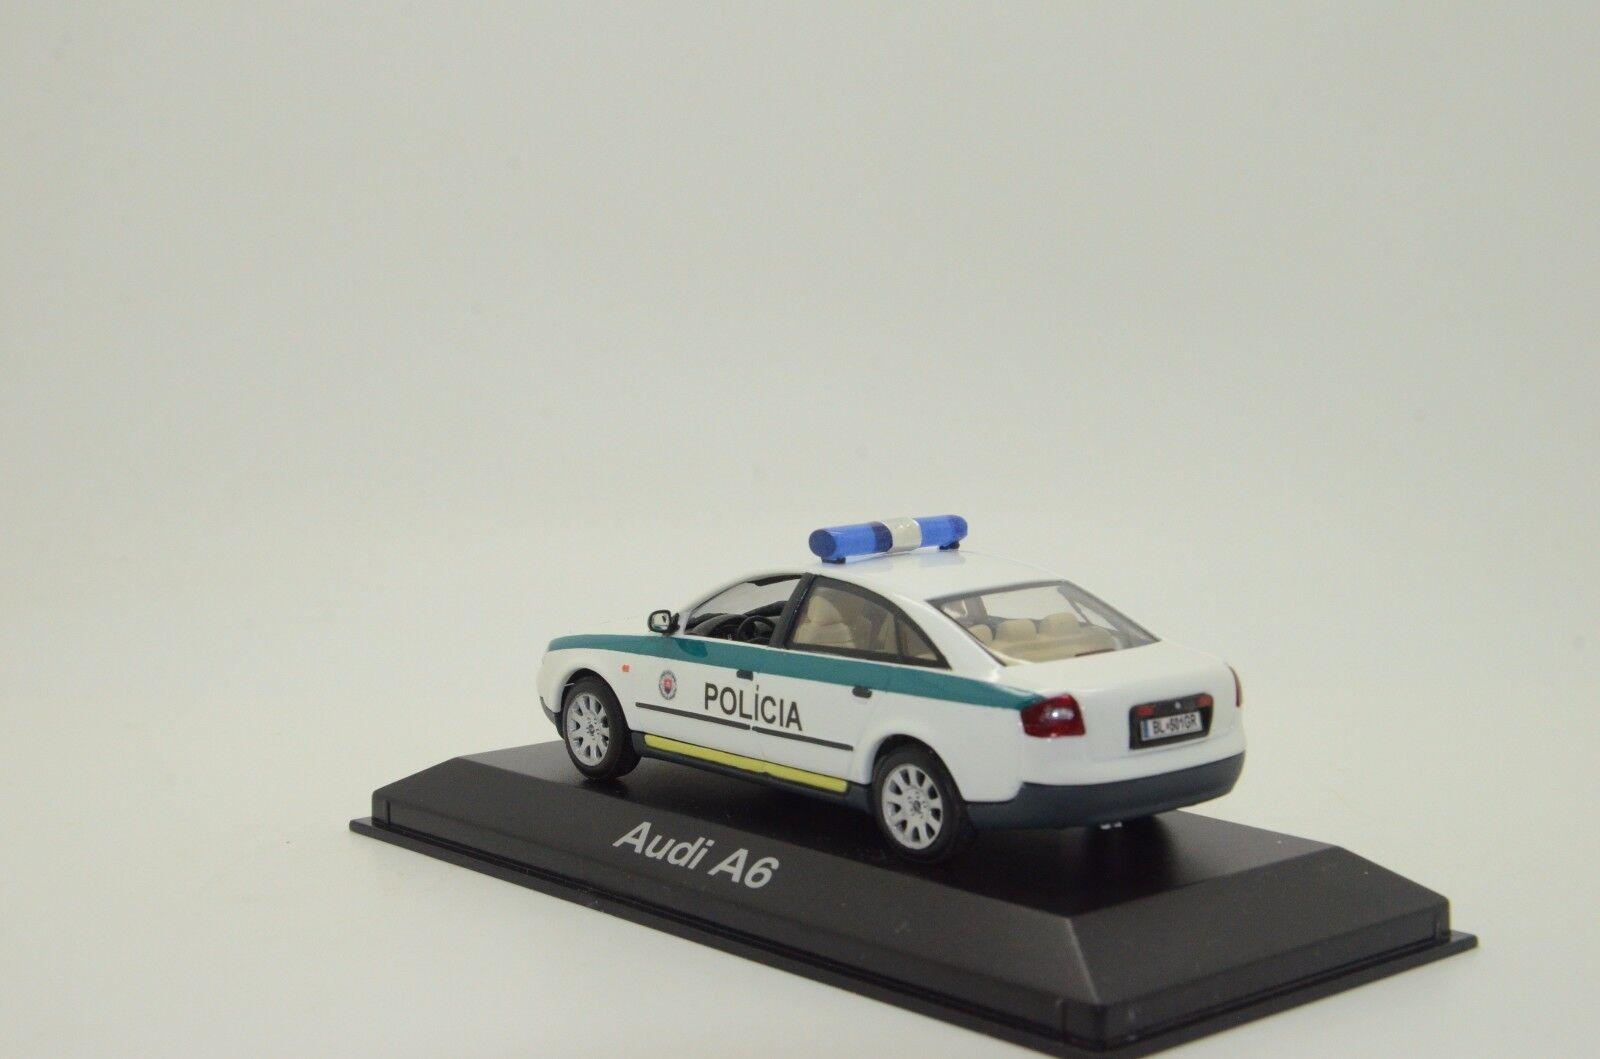 rara    Audi A6 POLICIA policía Eslovaquia Hecho a Medida 1 43 df73c9